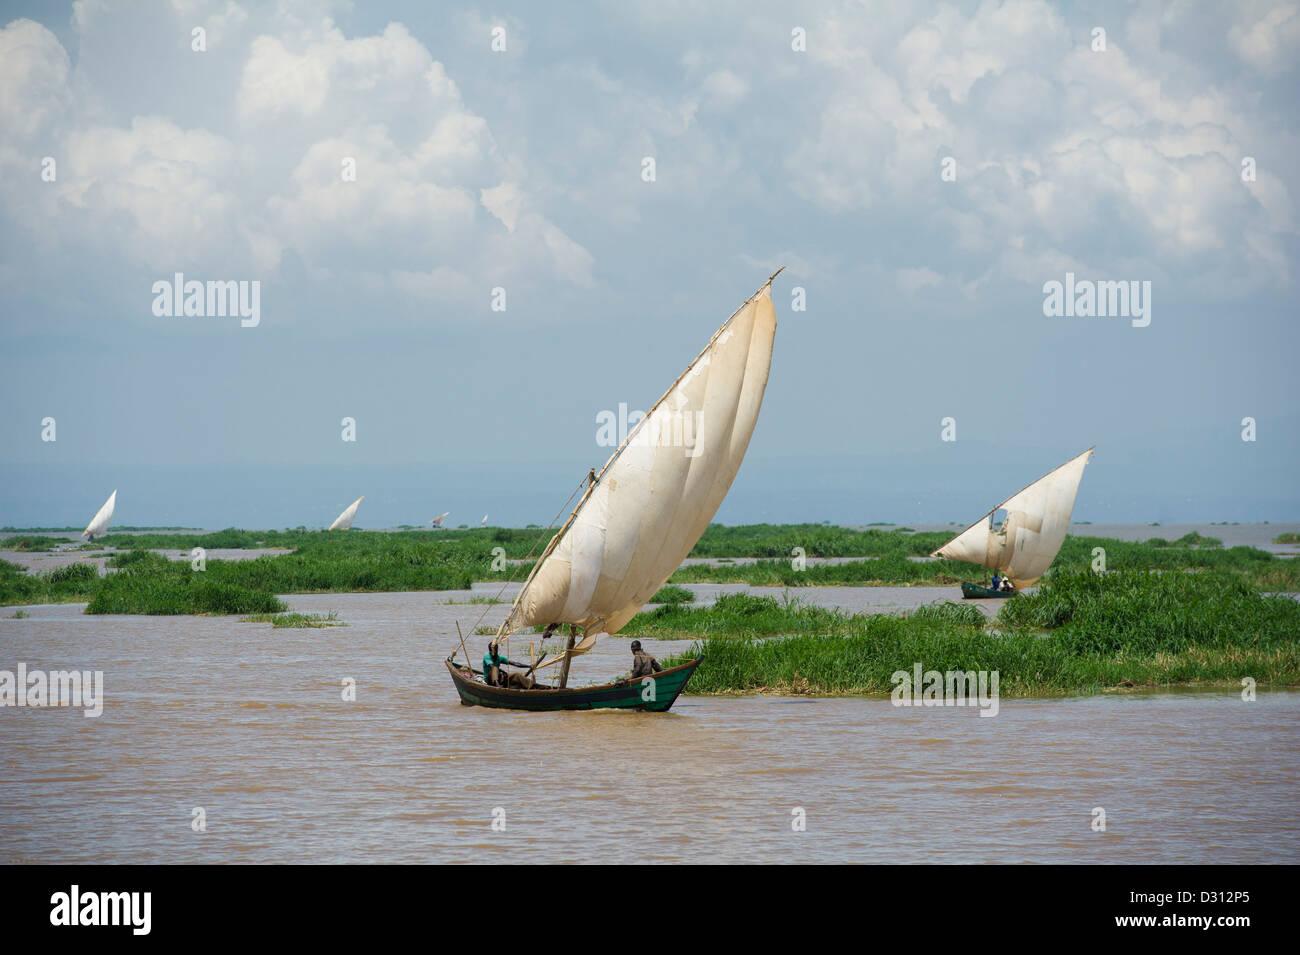 Fishing dhows, Kendu Bay, Lake Victoria, Kenya Stock Photo